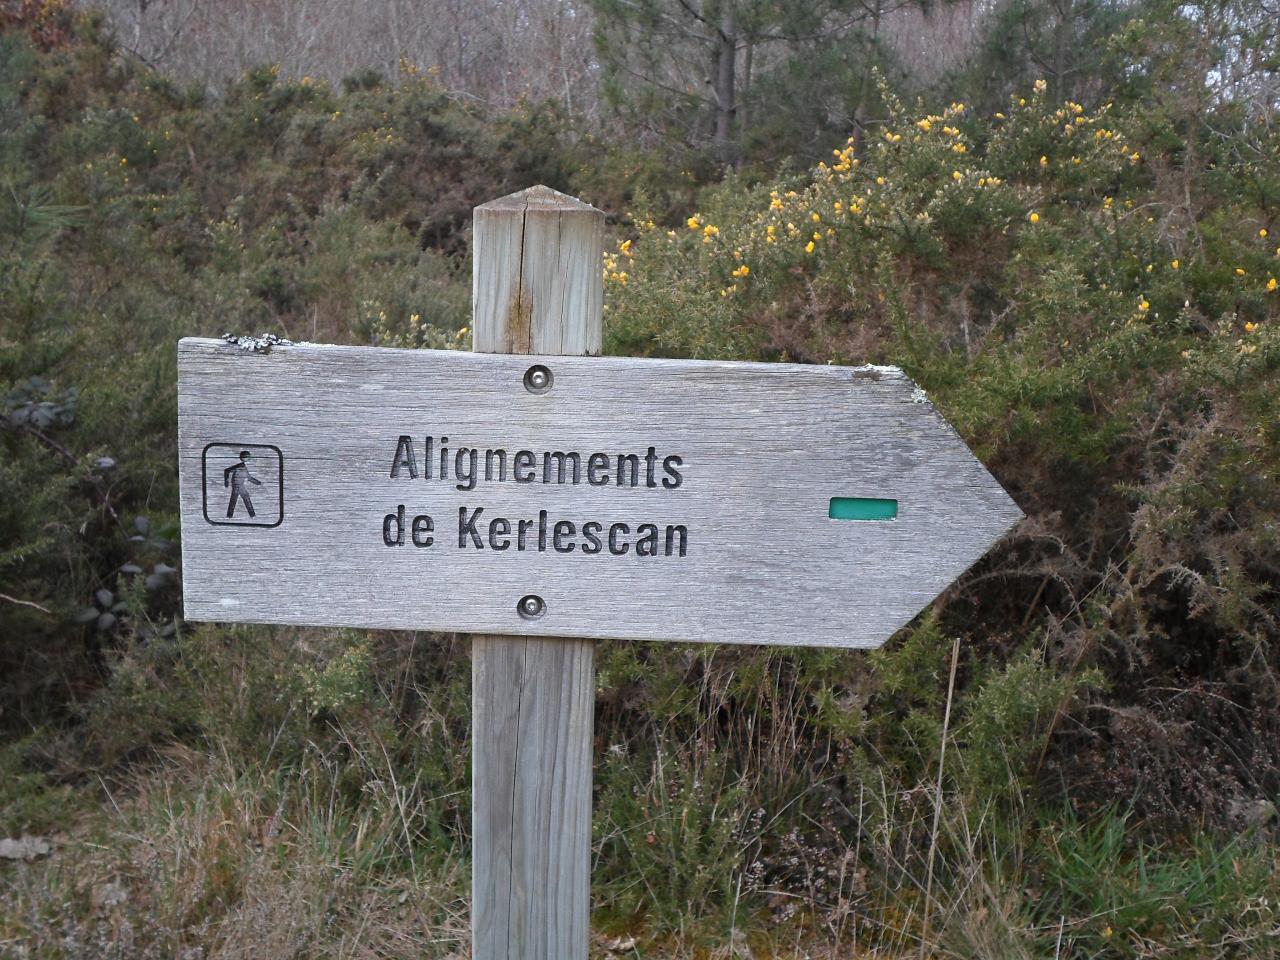 carnac-alignements-10-1.jpg